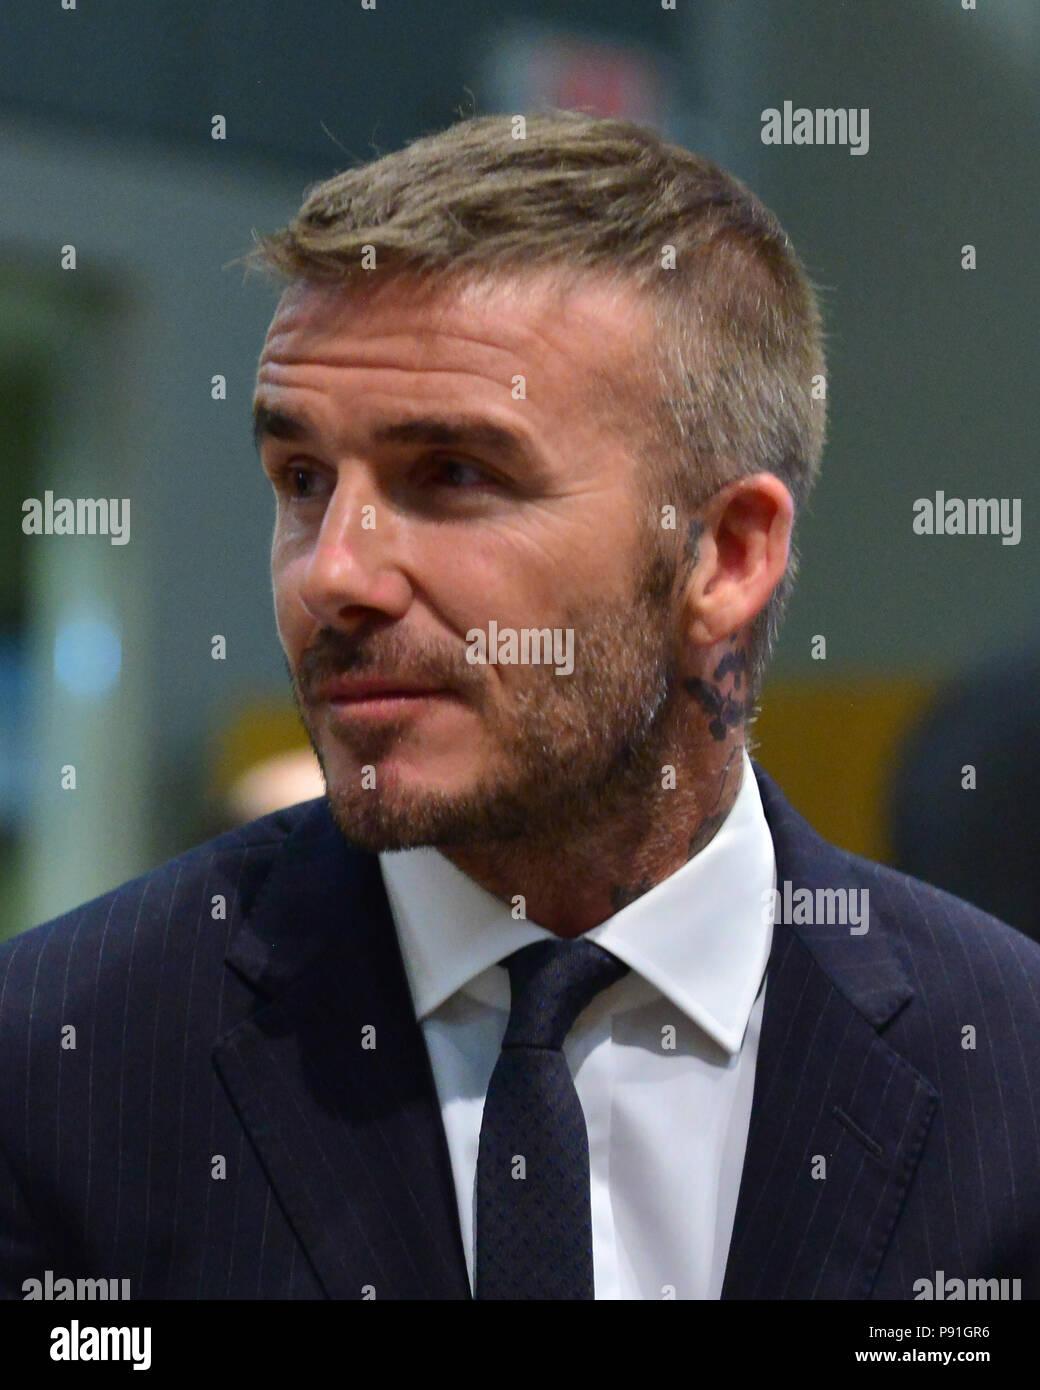 Miami Florida Usa 12th July 2018 David Beckham Attends A